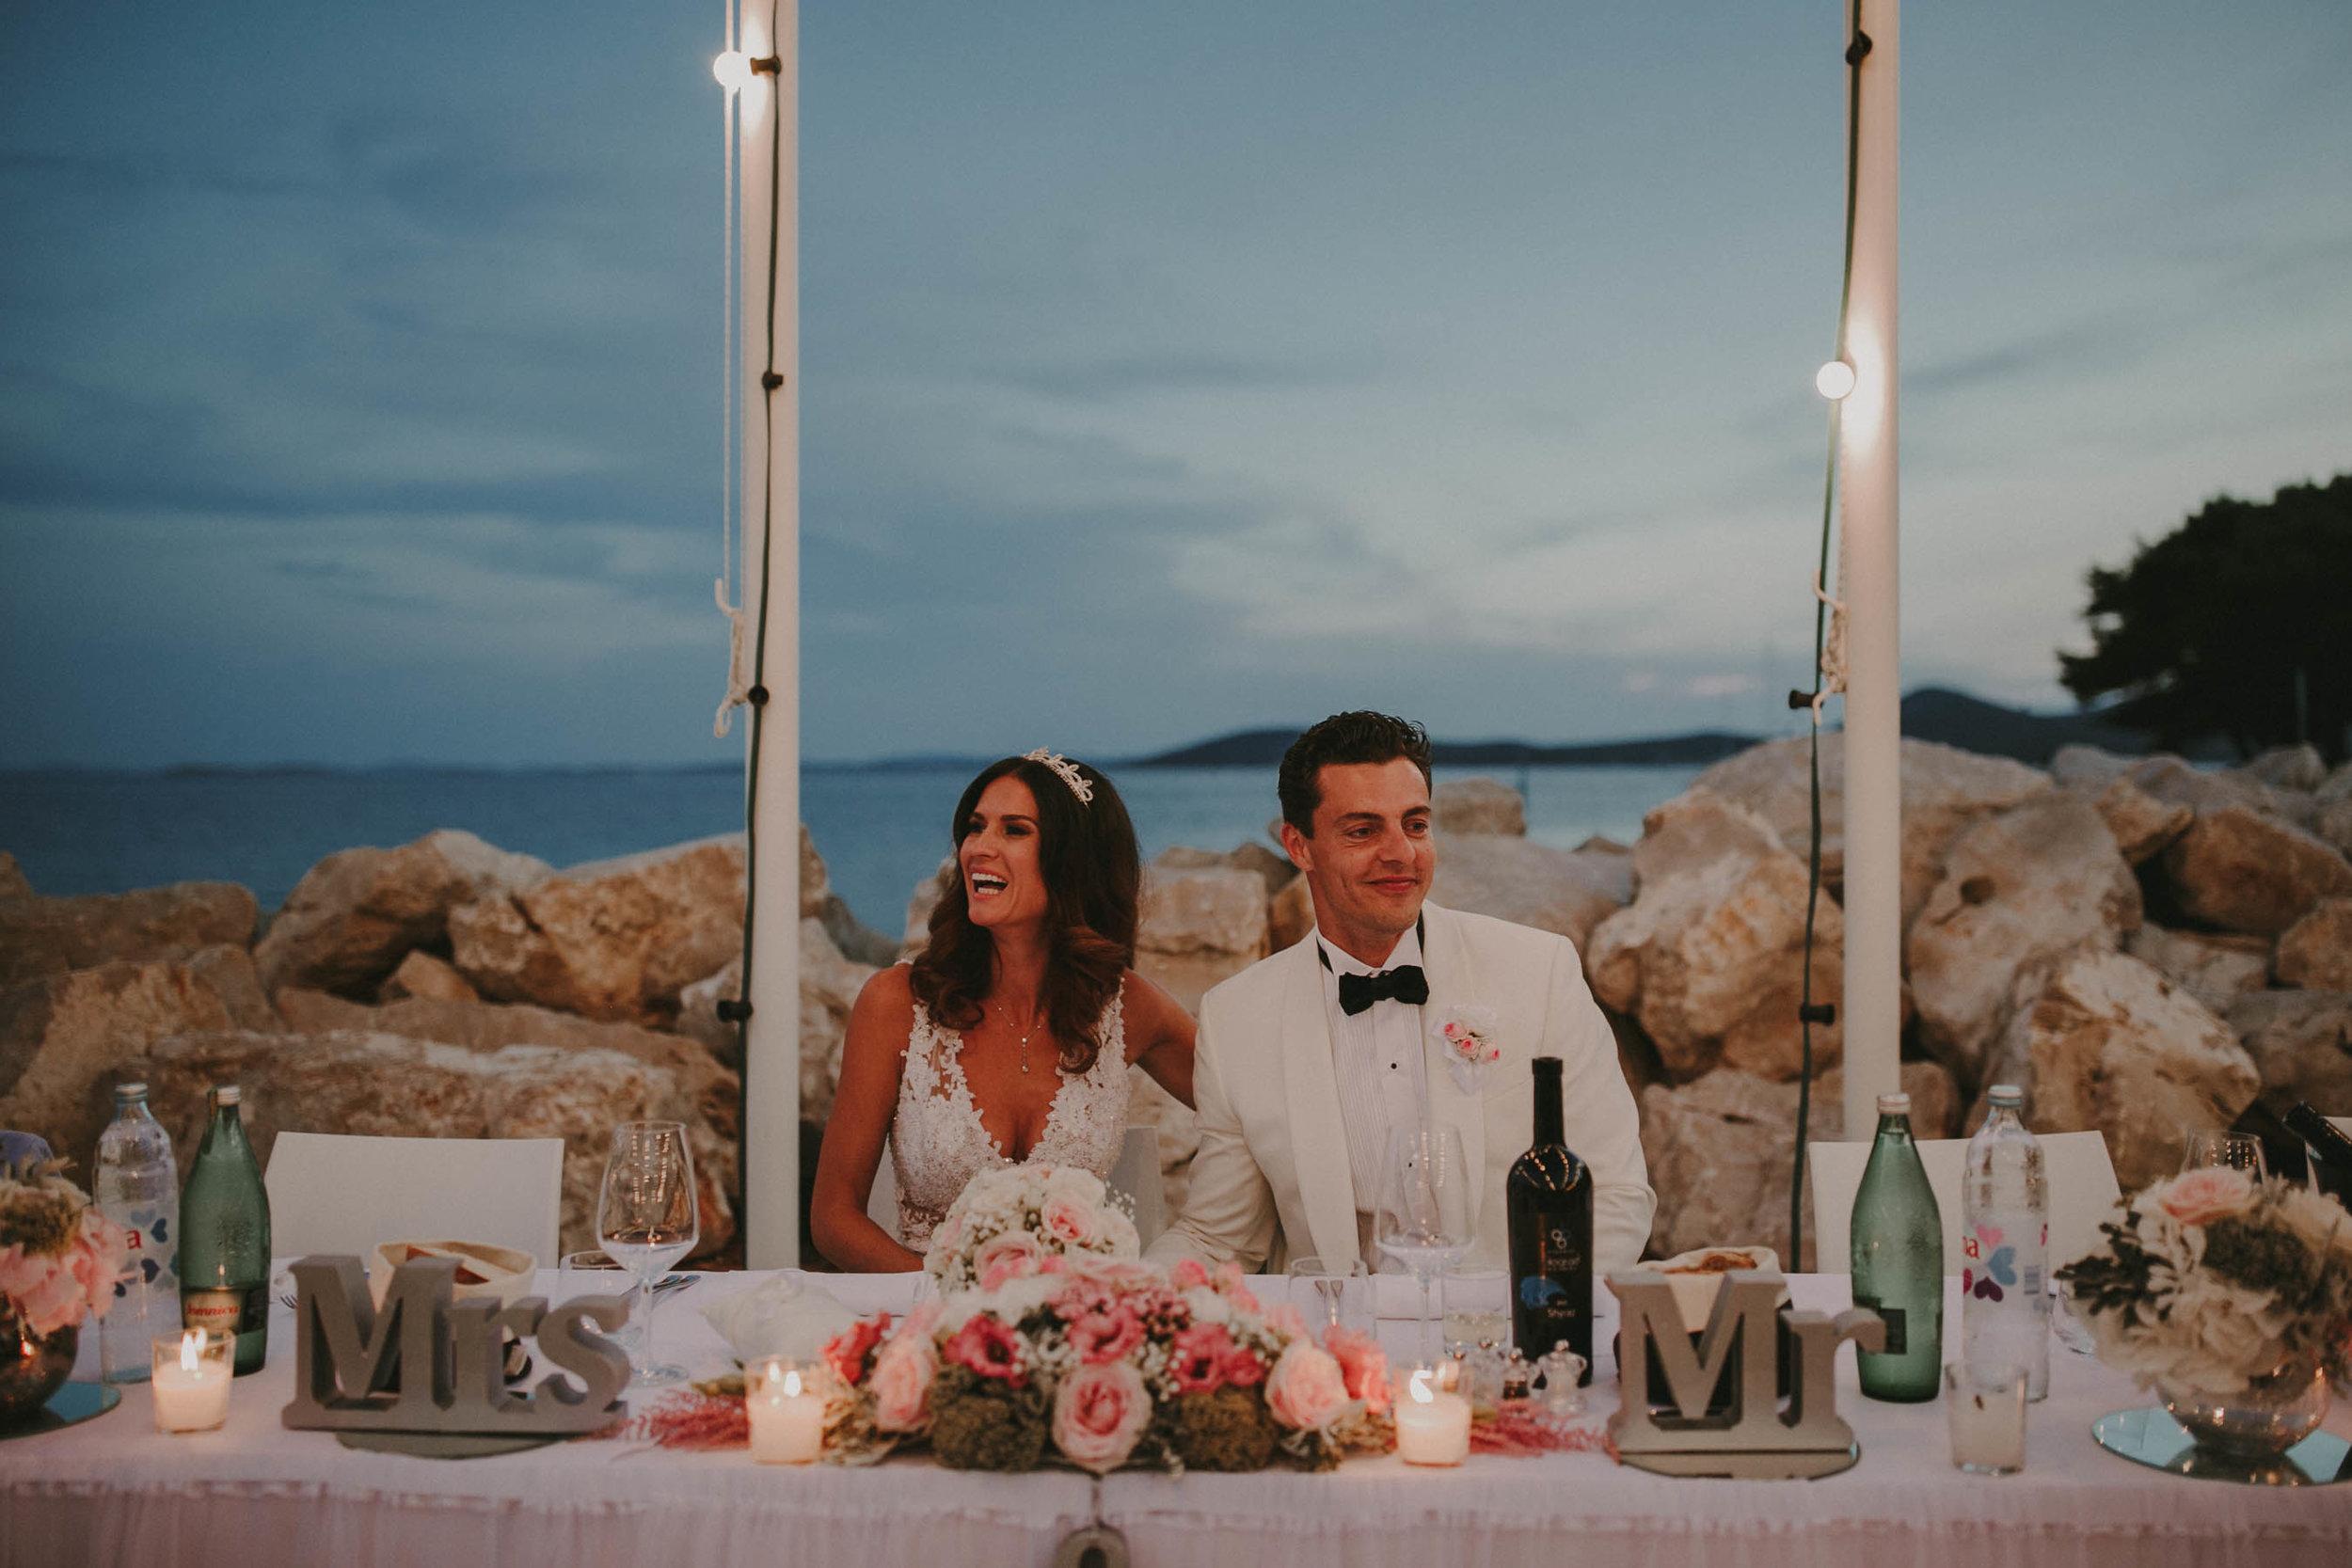 sylvia&dimitri-Wedding-Crvena_Luka-Croatia-88(9126).jpg